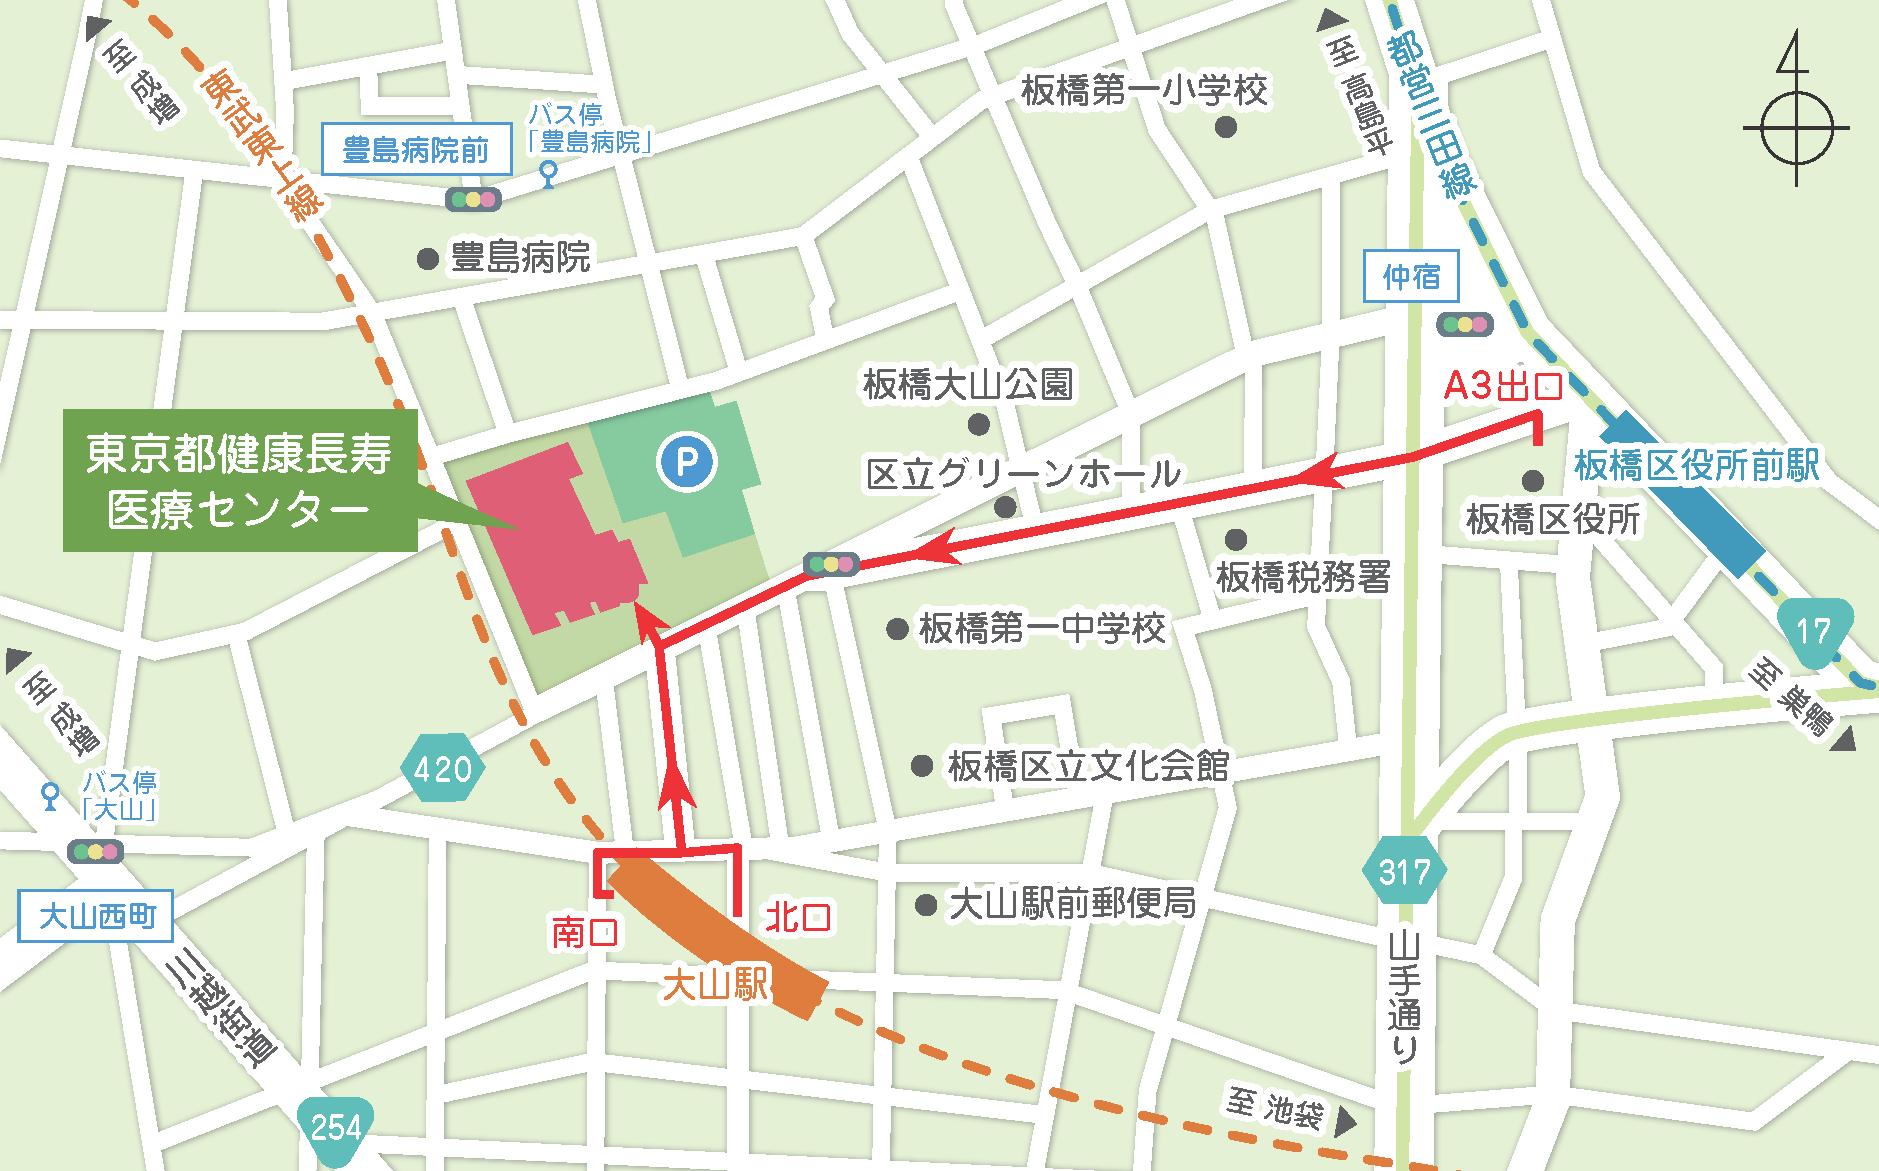 東京都健康長寿医療センター地図.png